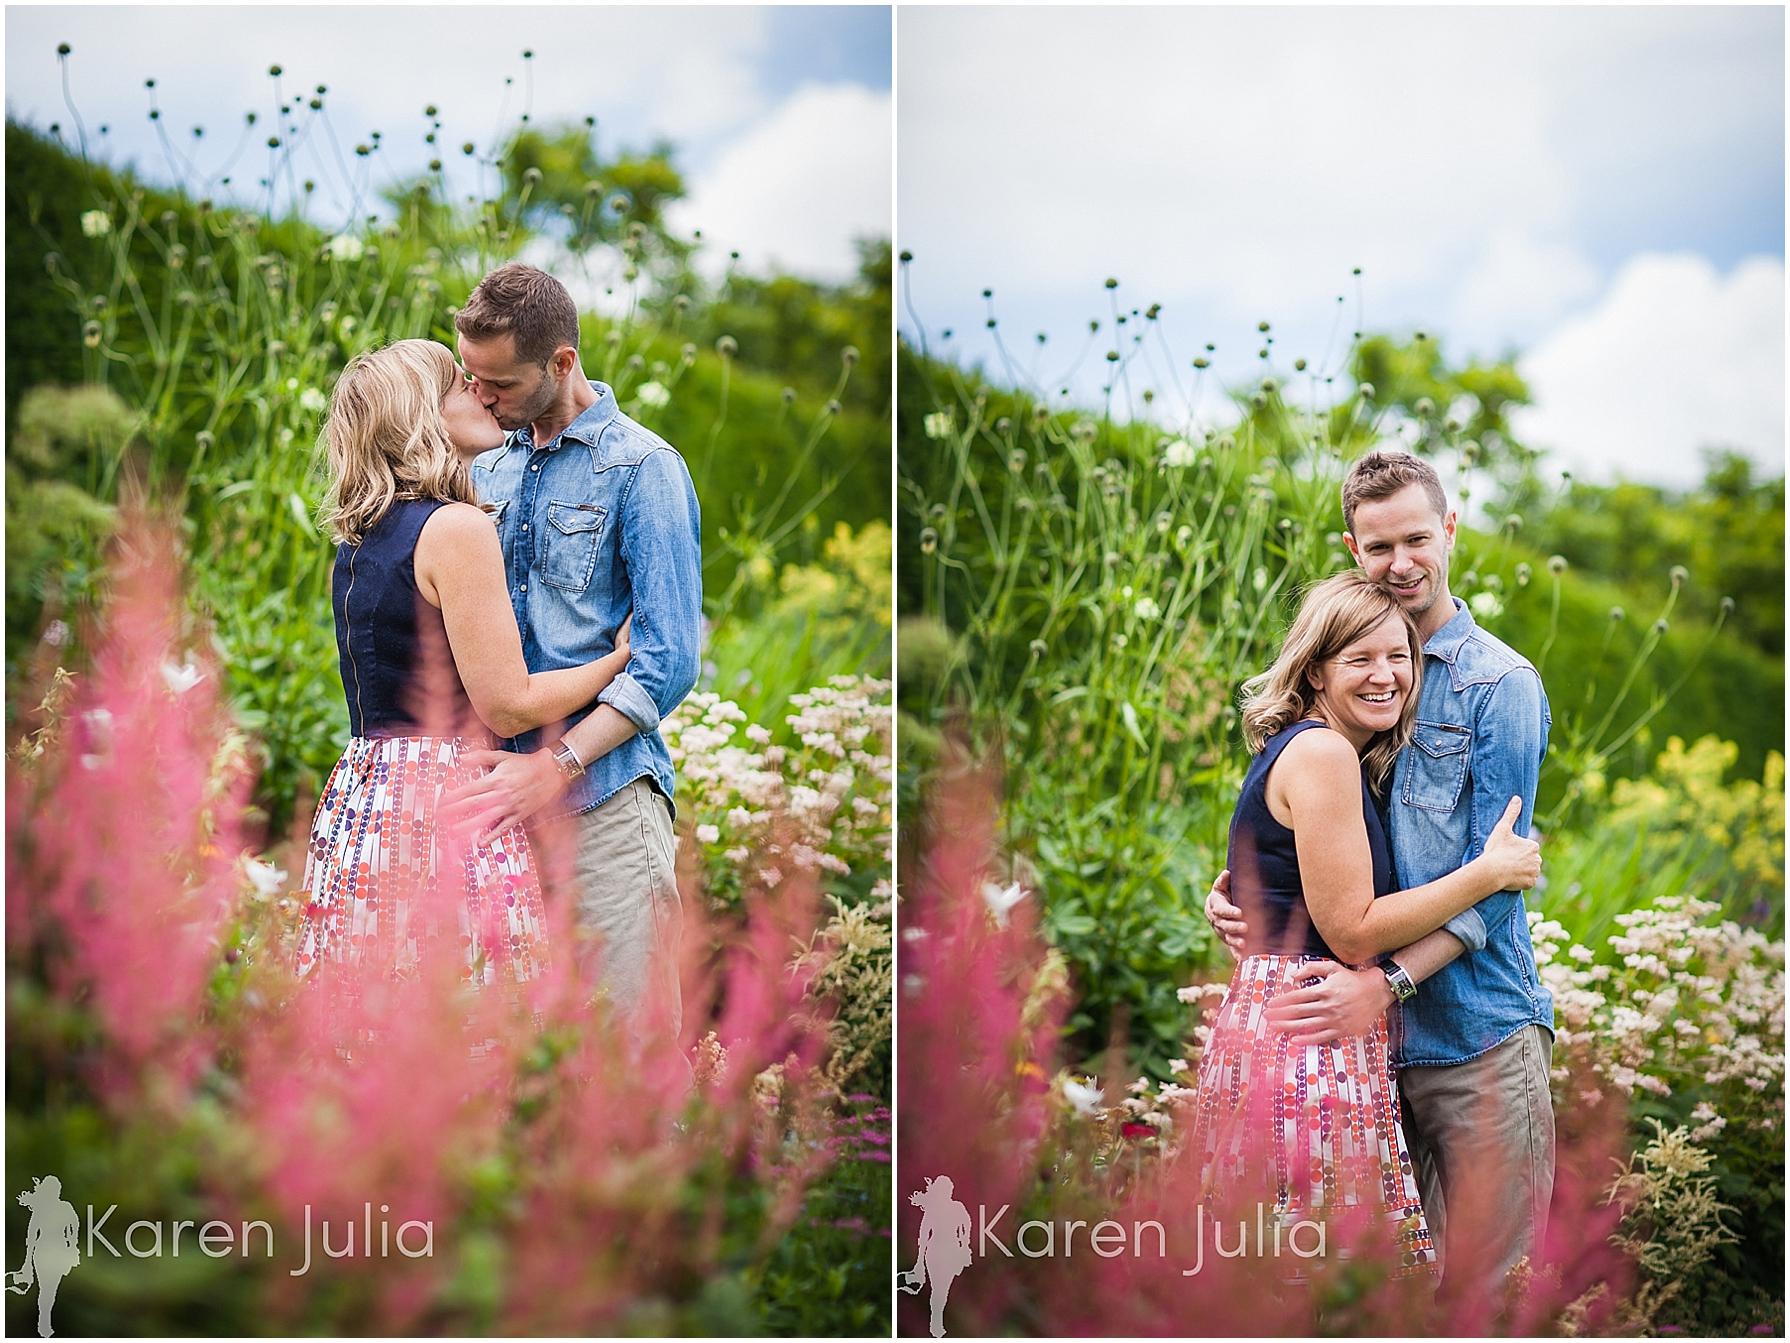 Arley Hall Engagement Shoot